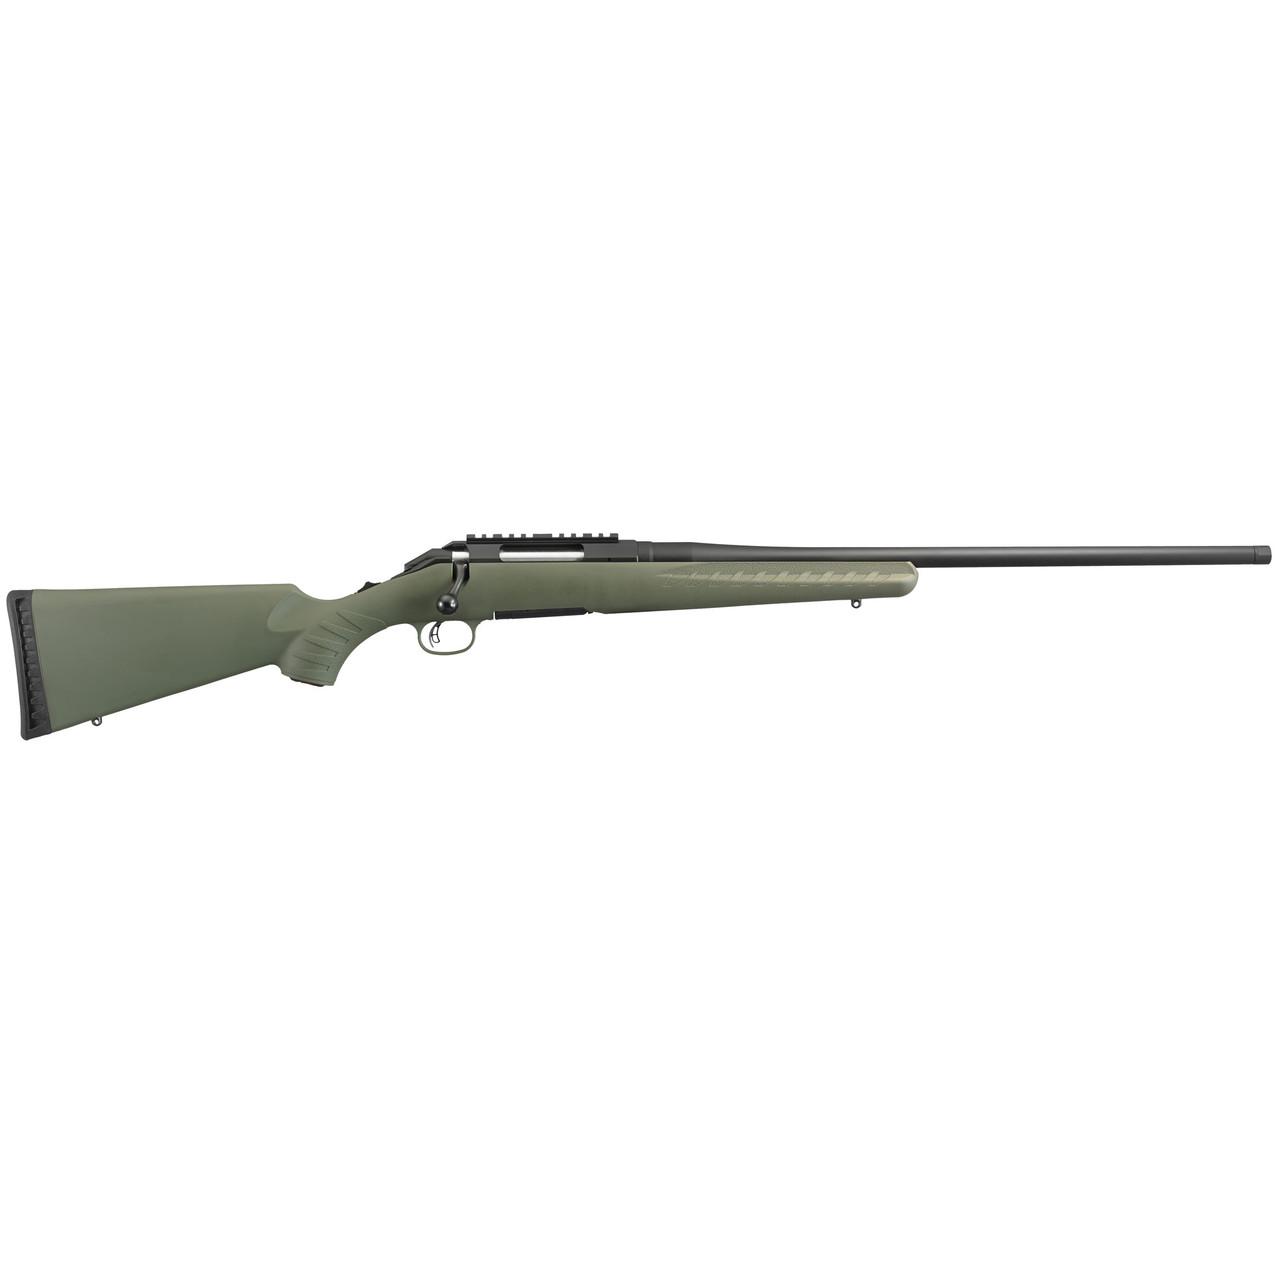 Ruger American Predator Flush Fit Mag CALIFORNIA LEGAL - 6.5 Creedmoor - Moss Green